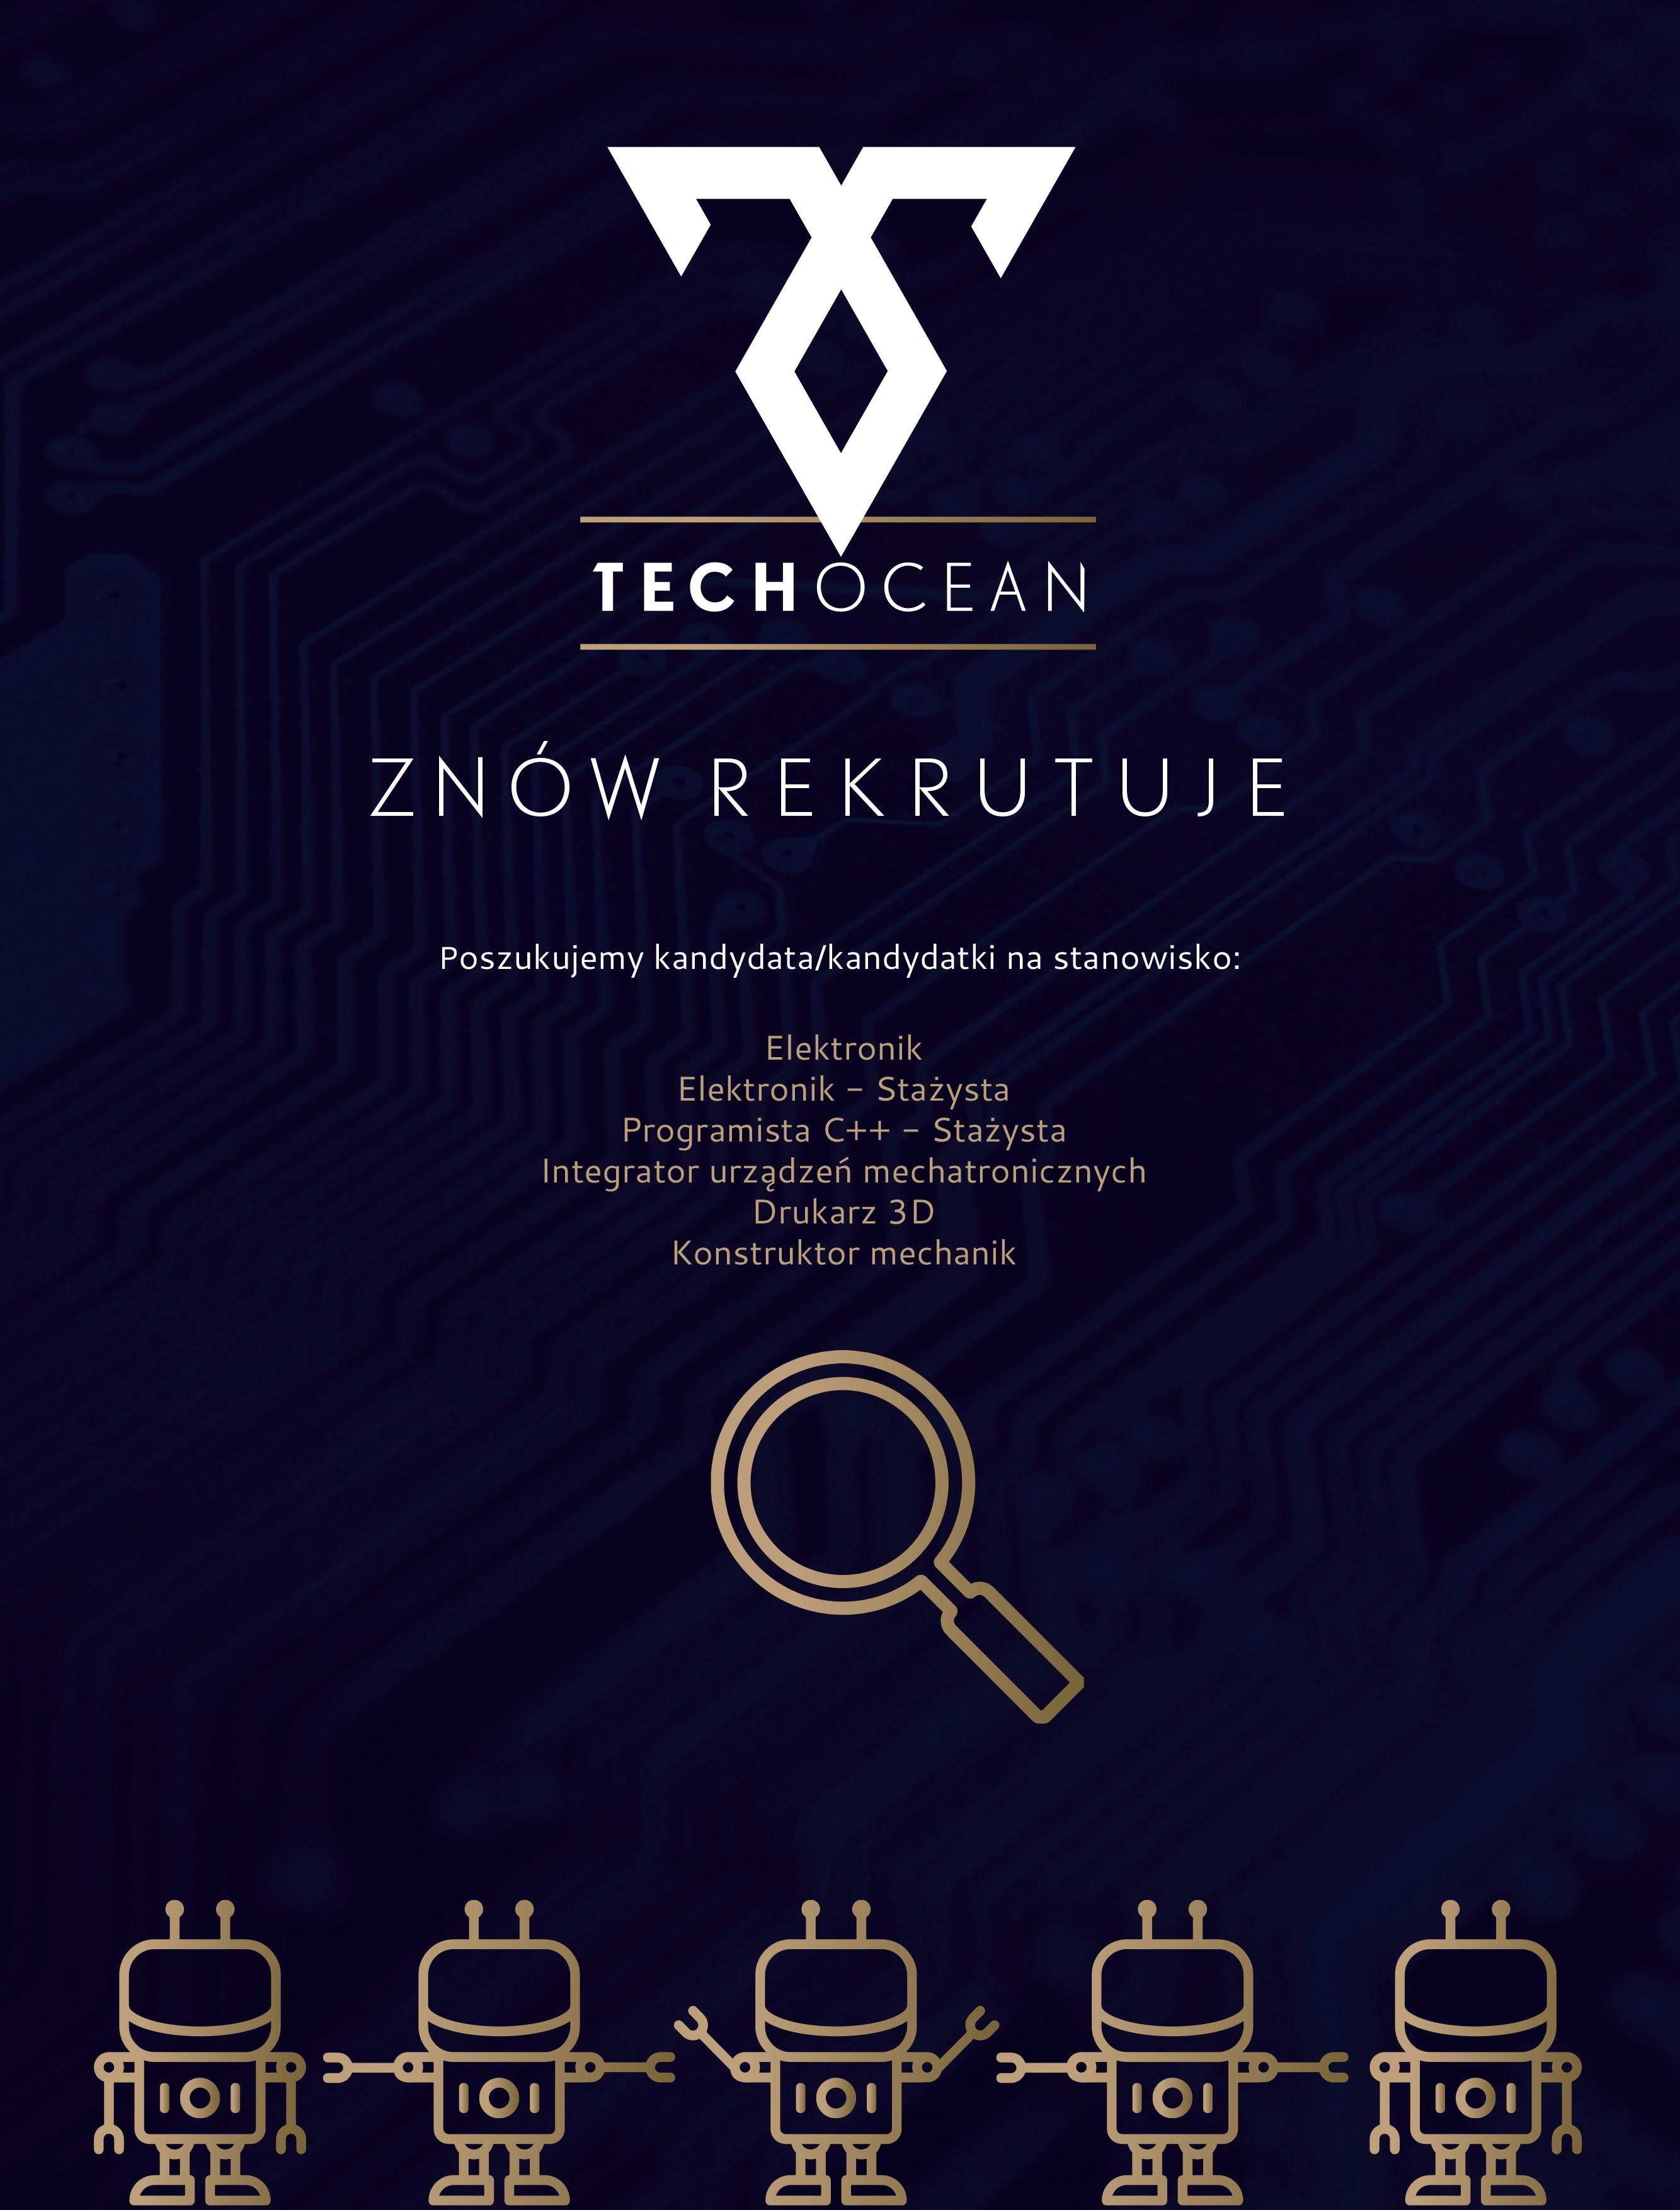 TechOcean znów rekrutuje!